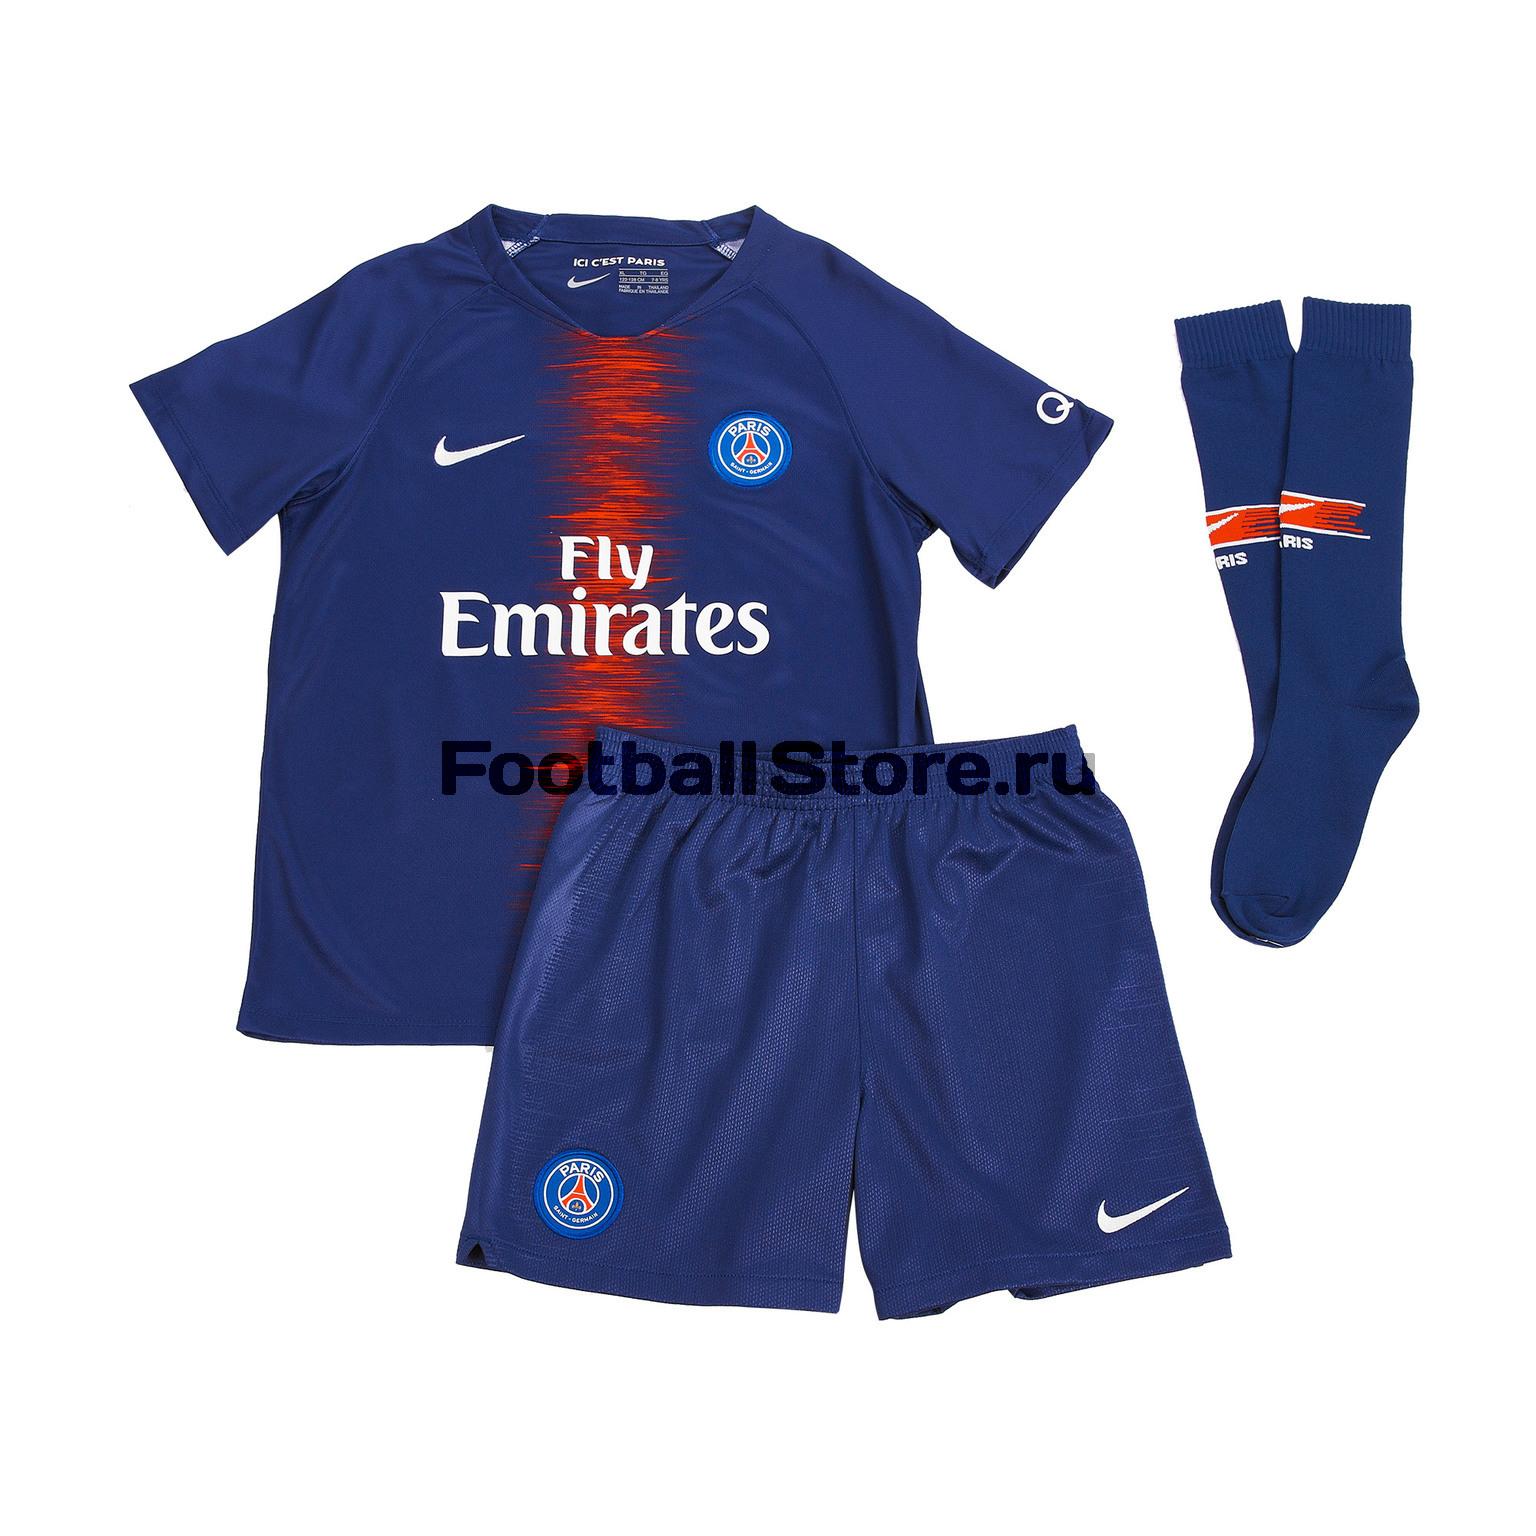 Комплект детской формы Nike PSG Home 2018/19 сумка nike stadium psg tote ba5523 421